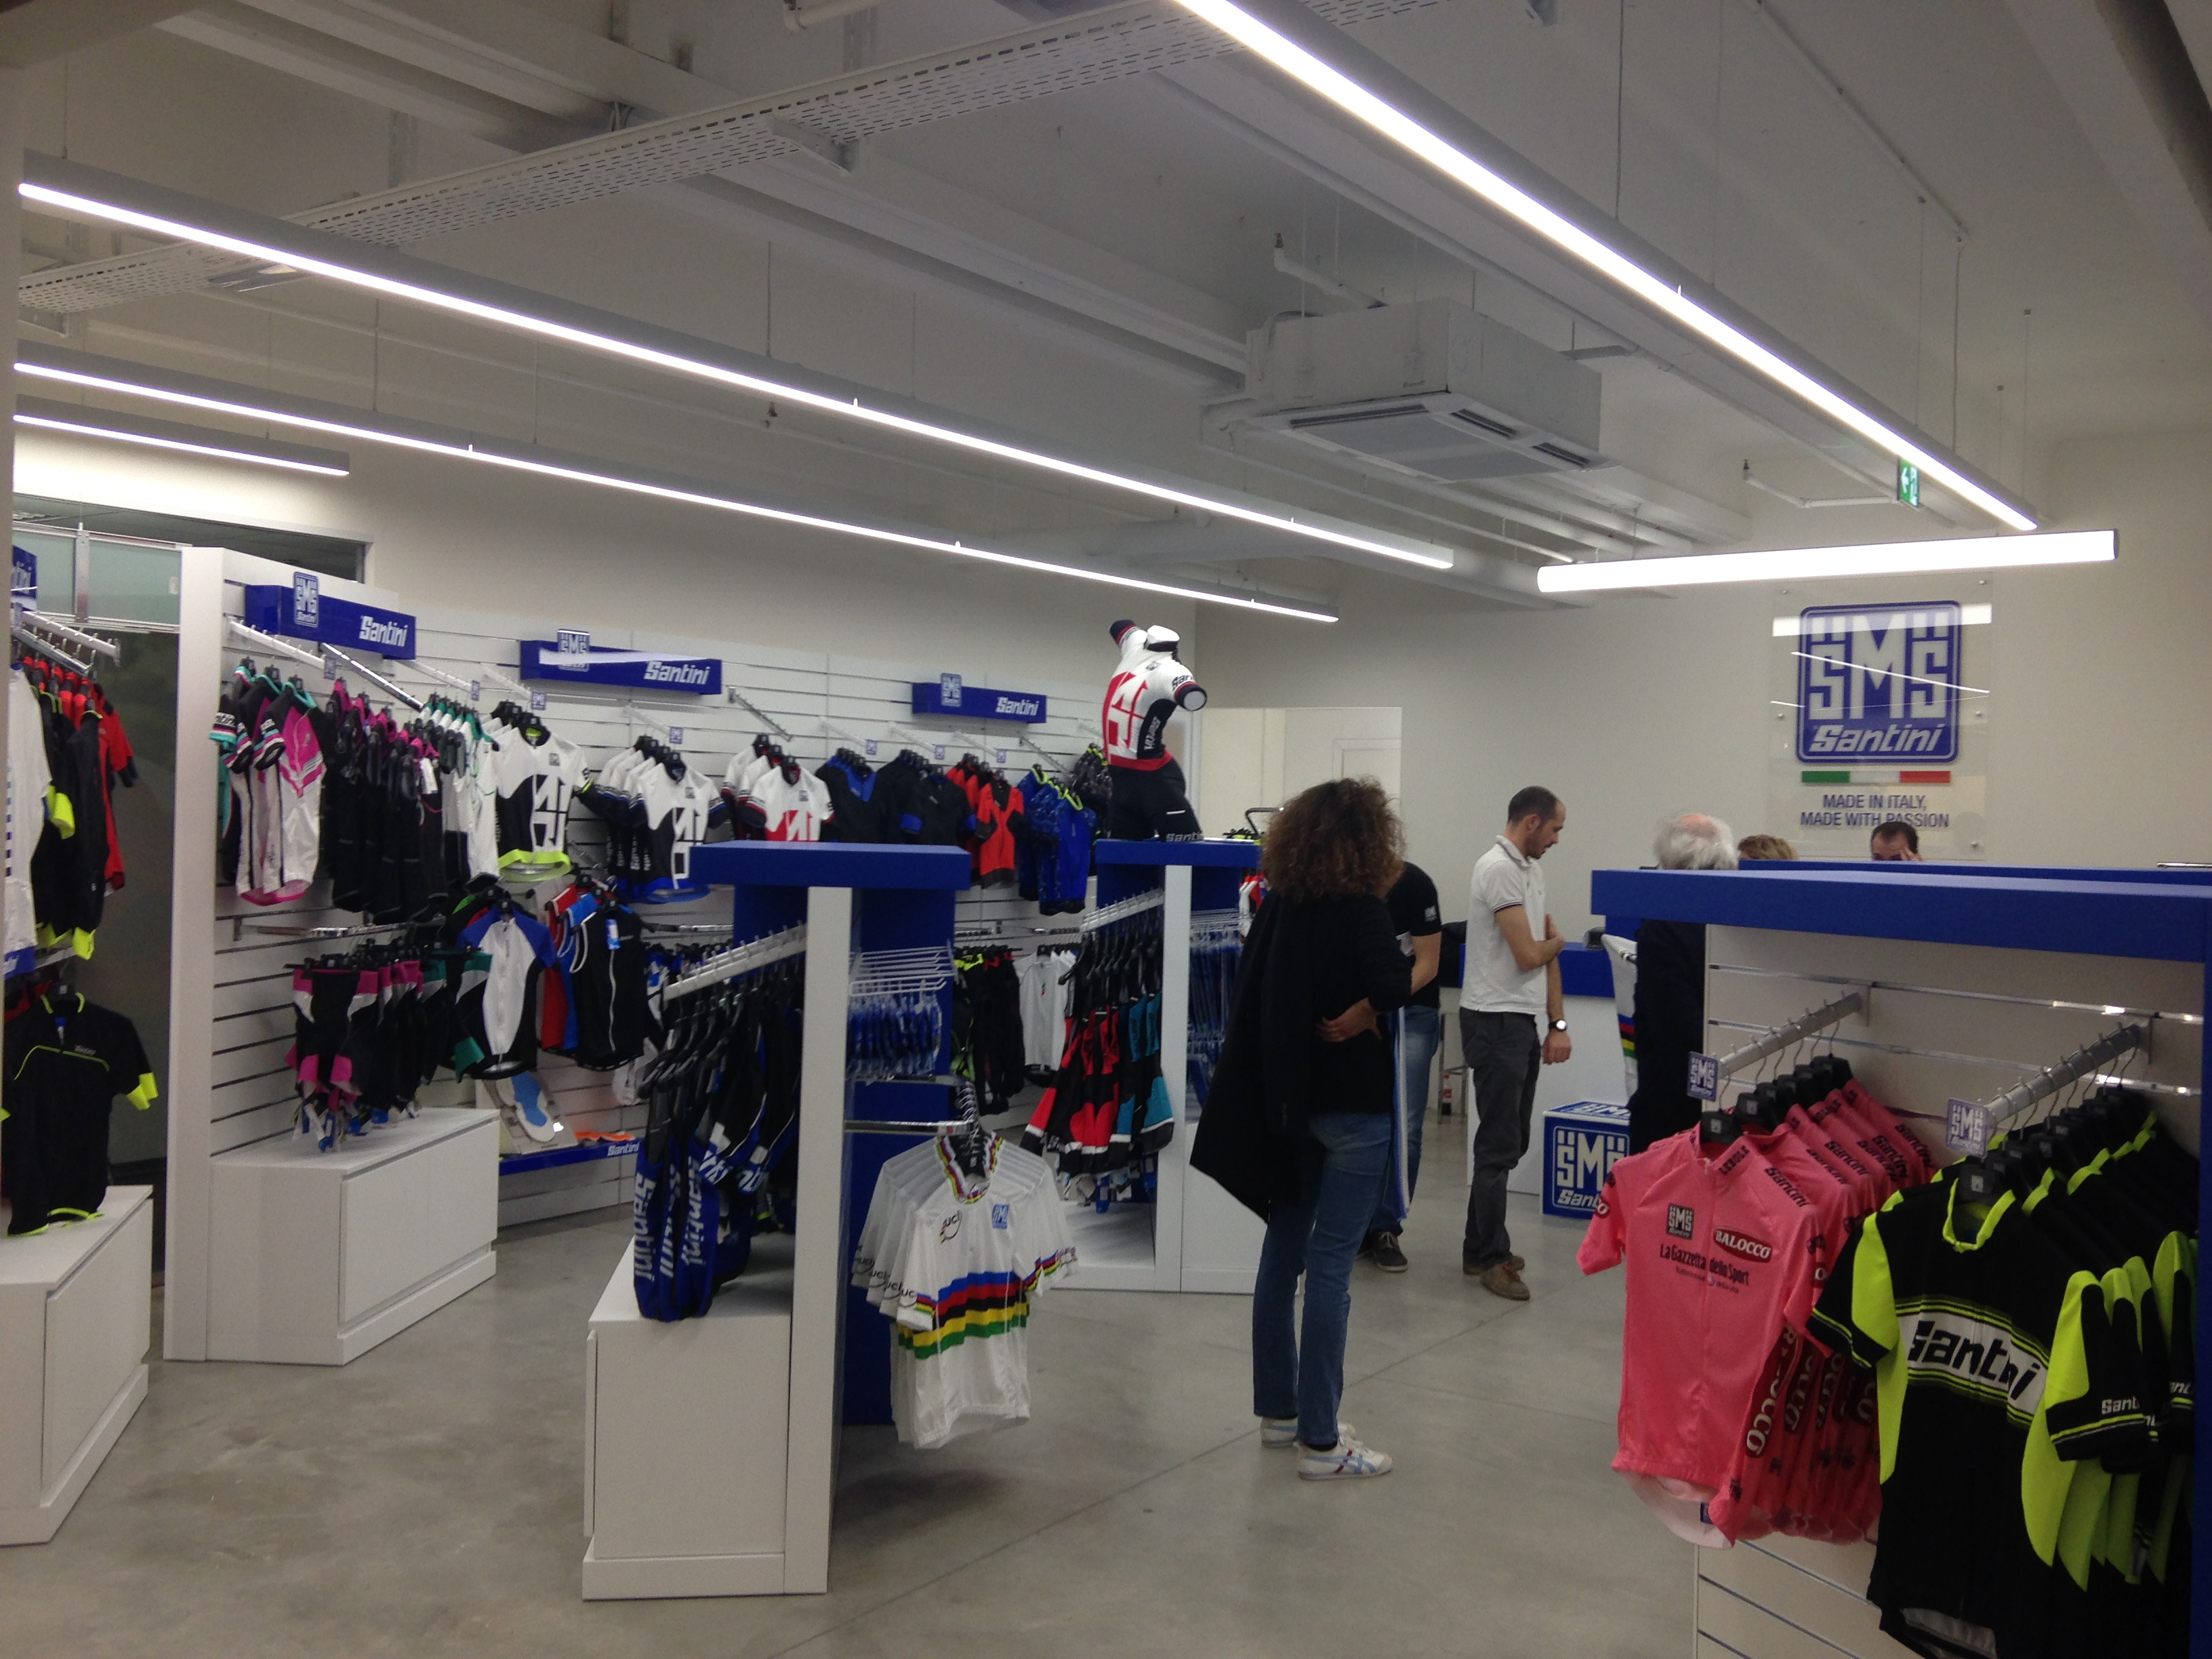 Illuminazione per negozi alta resa cromaticaessenzialed